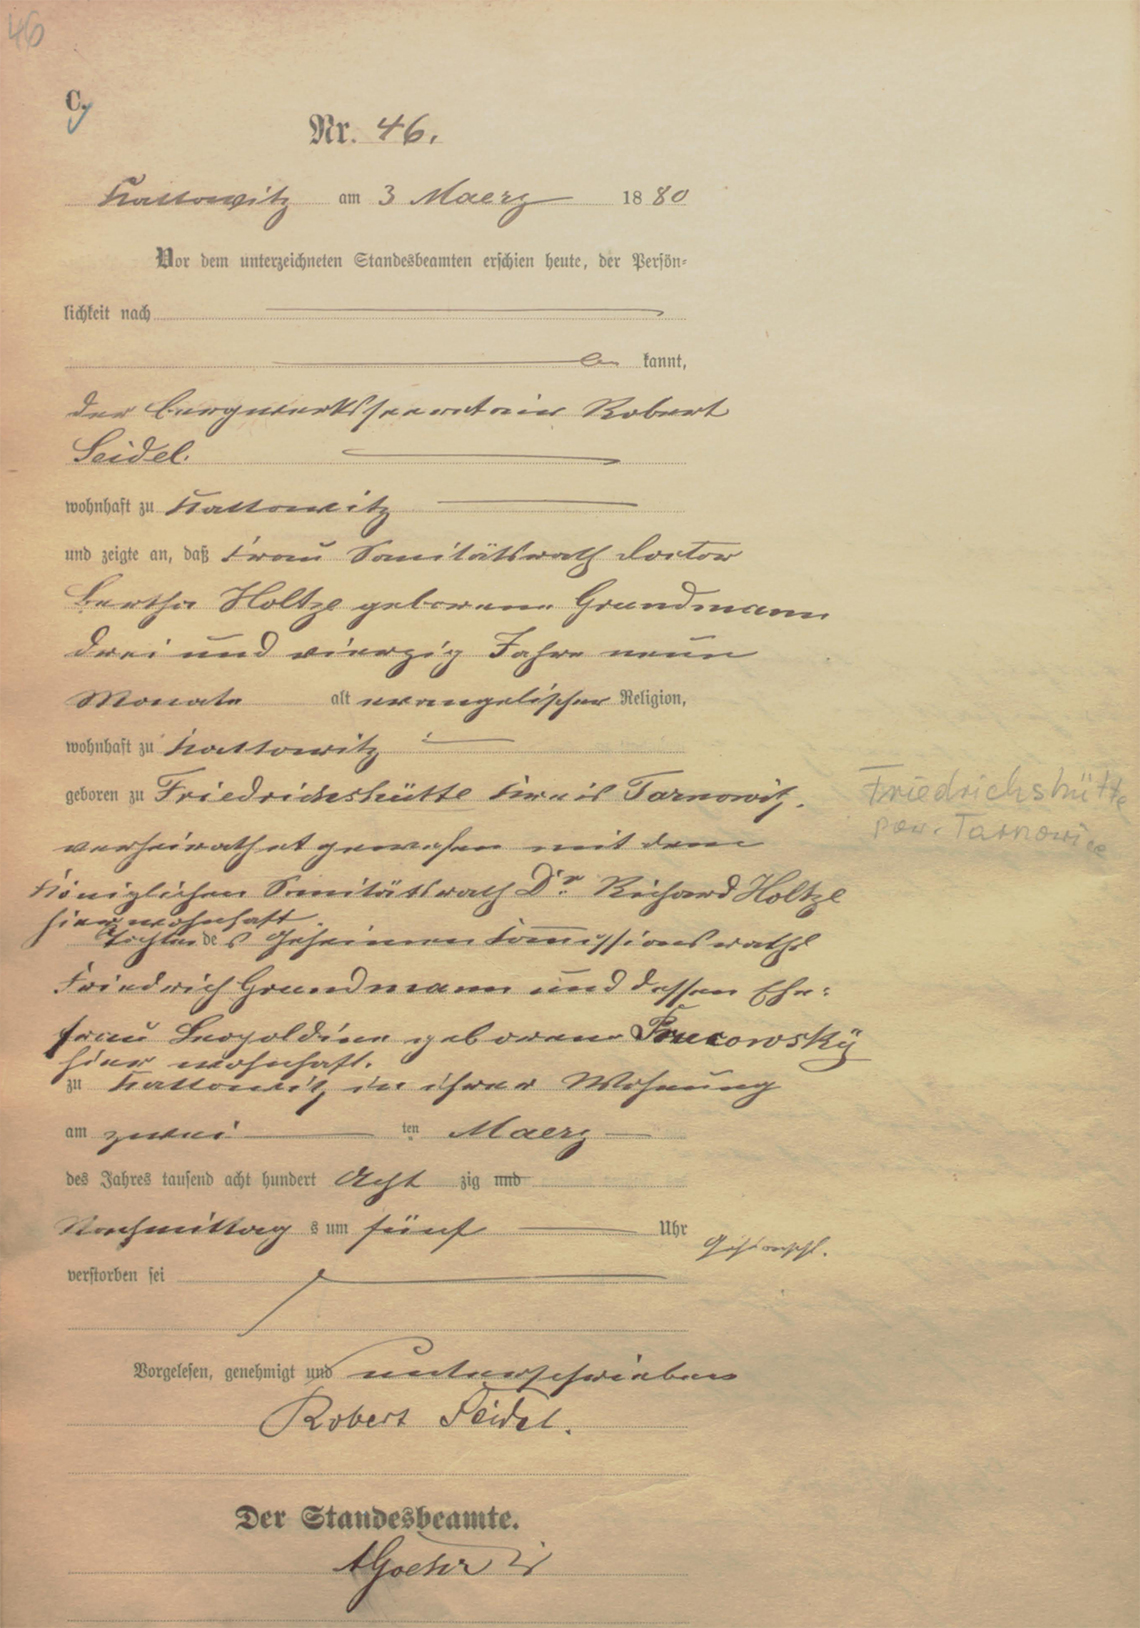 Akt USC zgonu Bertha Holtze 02.03.1880 r.